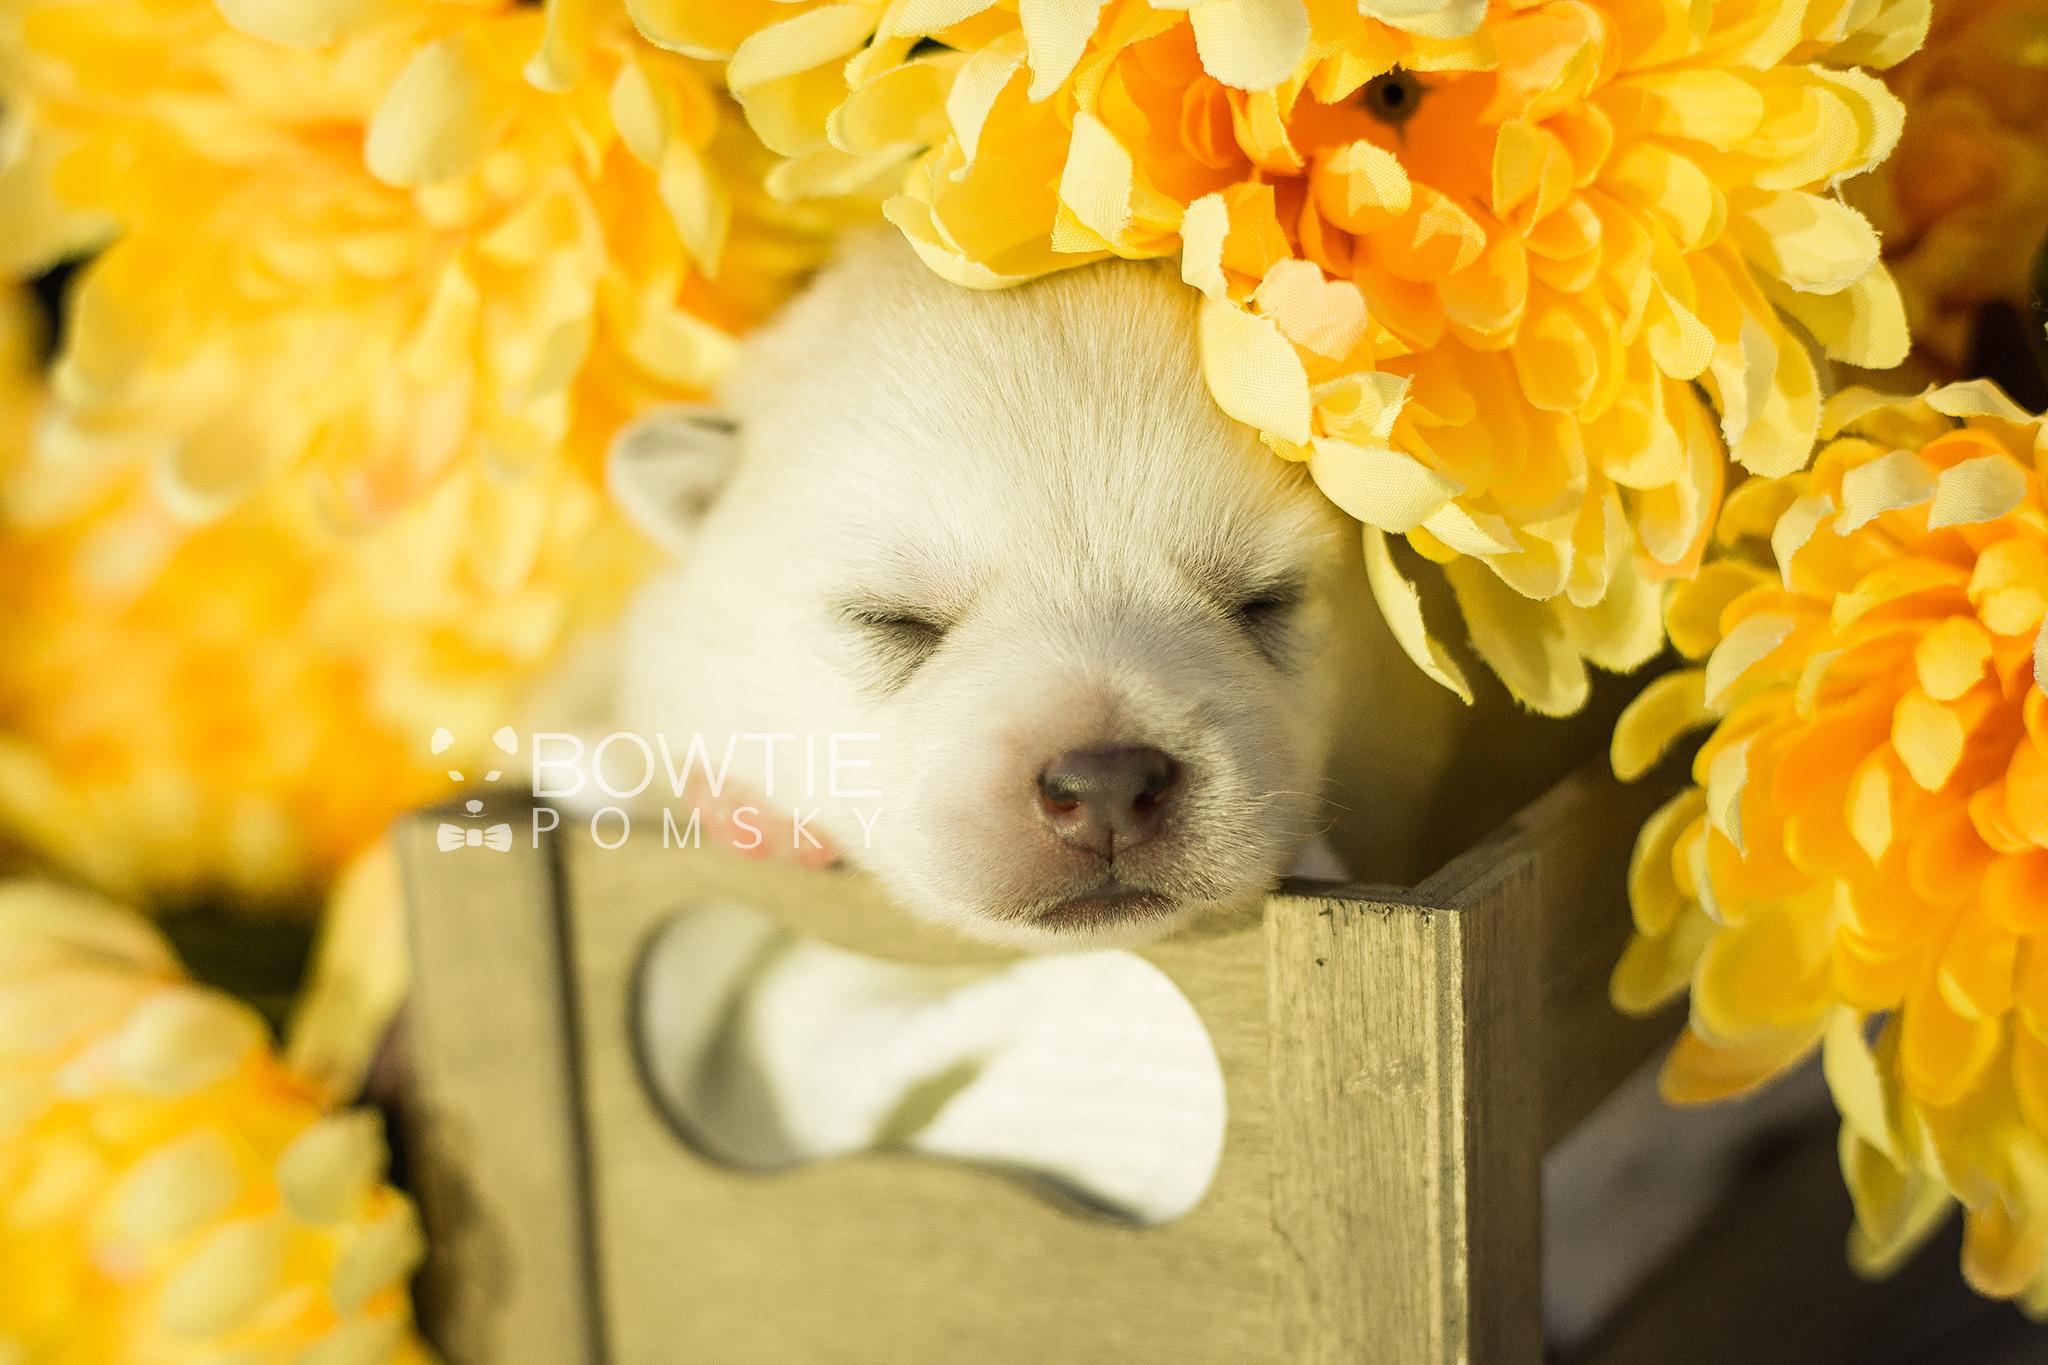 1st Gen Puppy – Girl – Charlotte - Bowtie Pomsky LLC